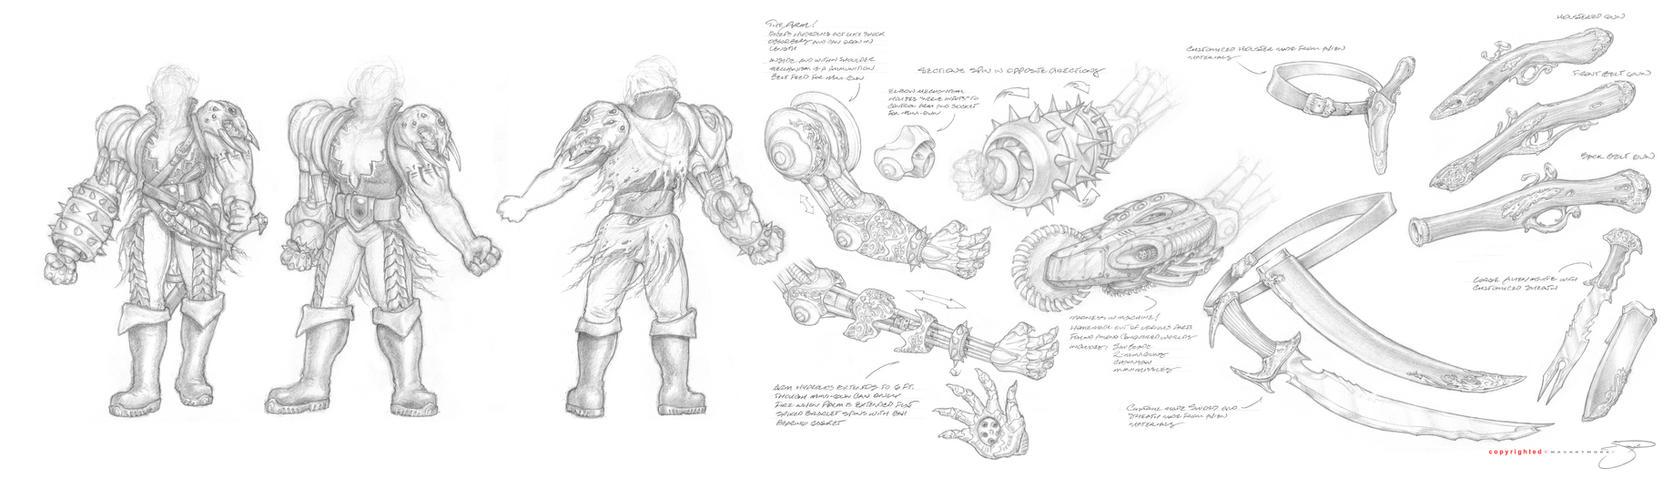 Gnarsh Uniform Design VI by mavartworx